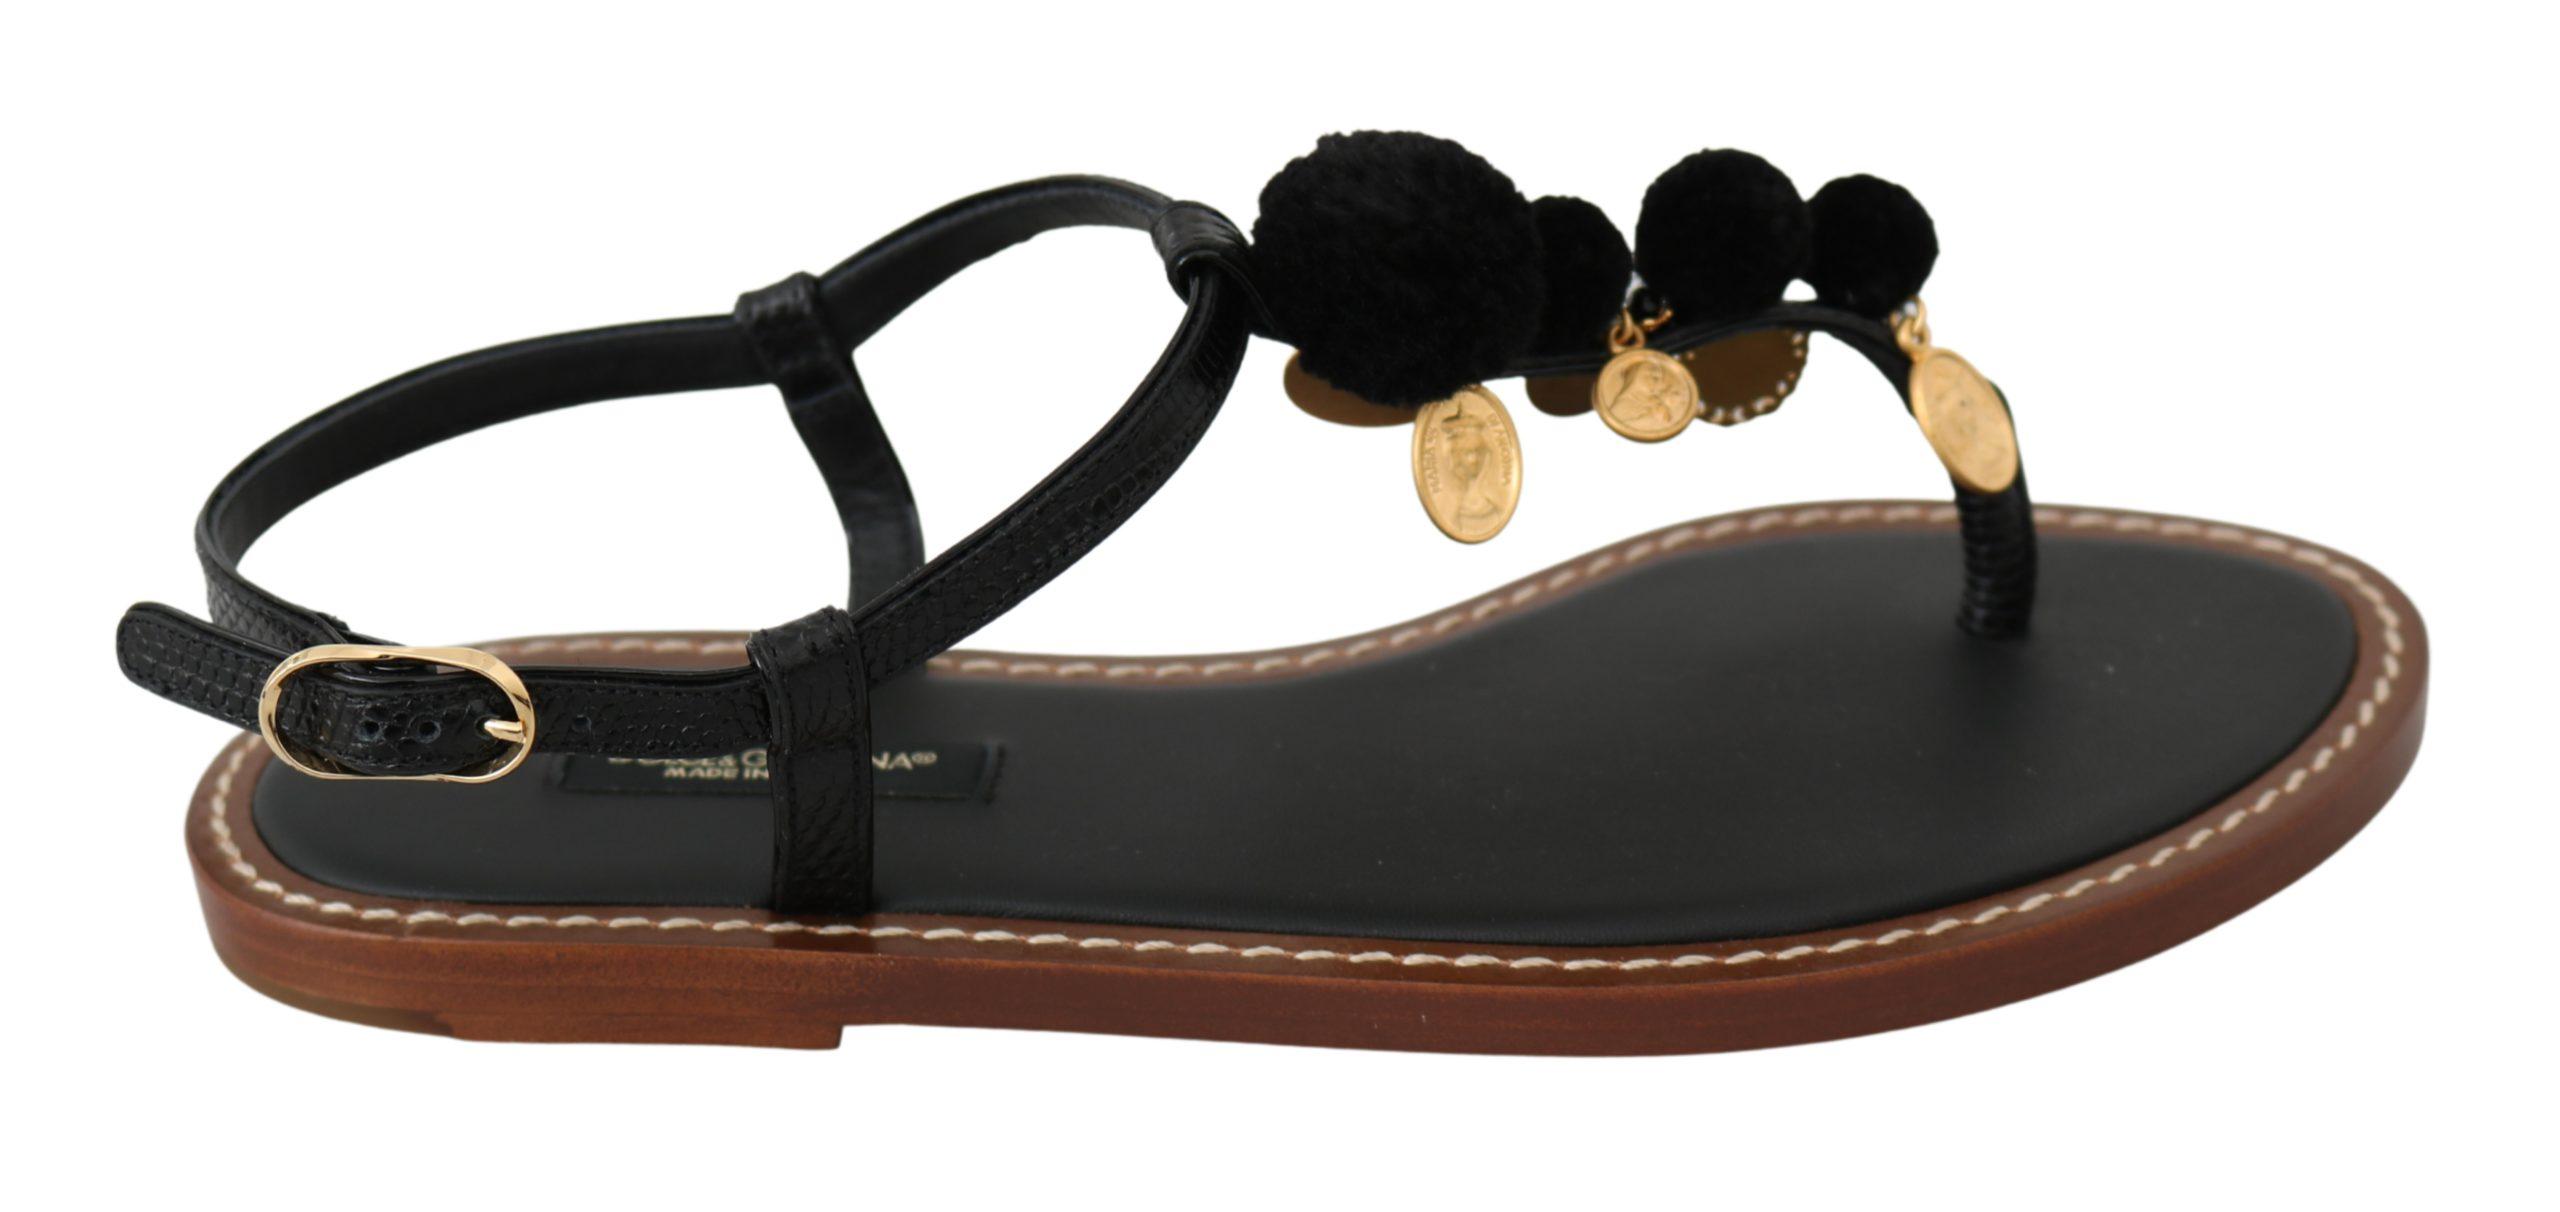 Dolce & Gabbana Women's Leather Coins Flat Shoe Black LA6577 - EU38.5/US8